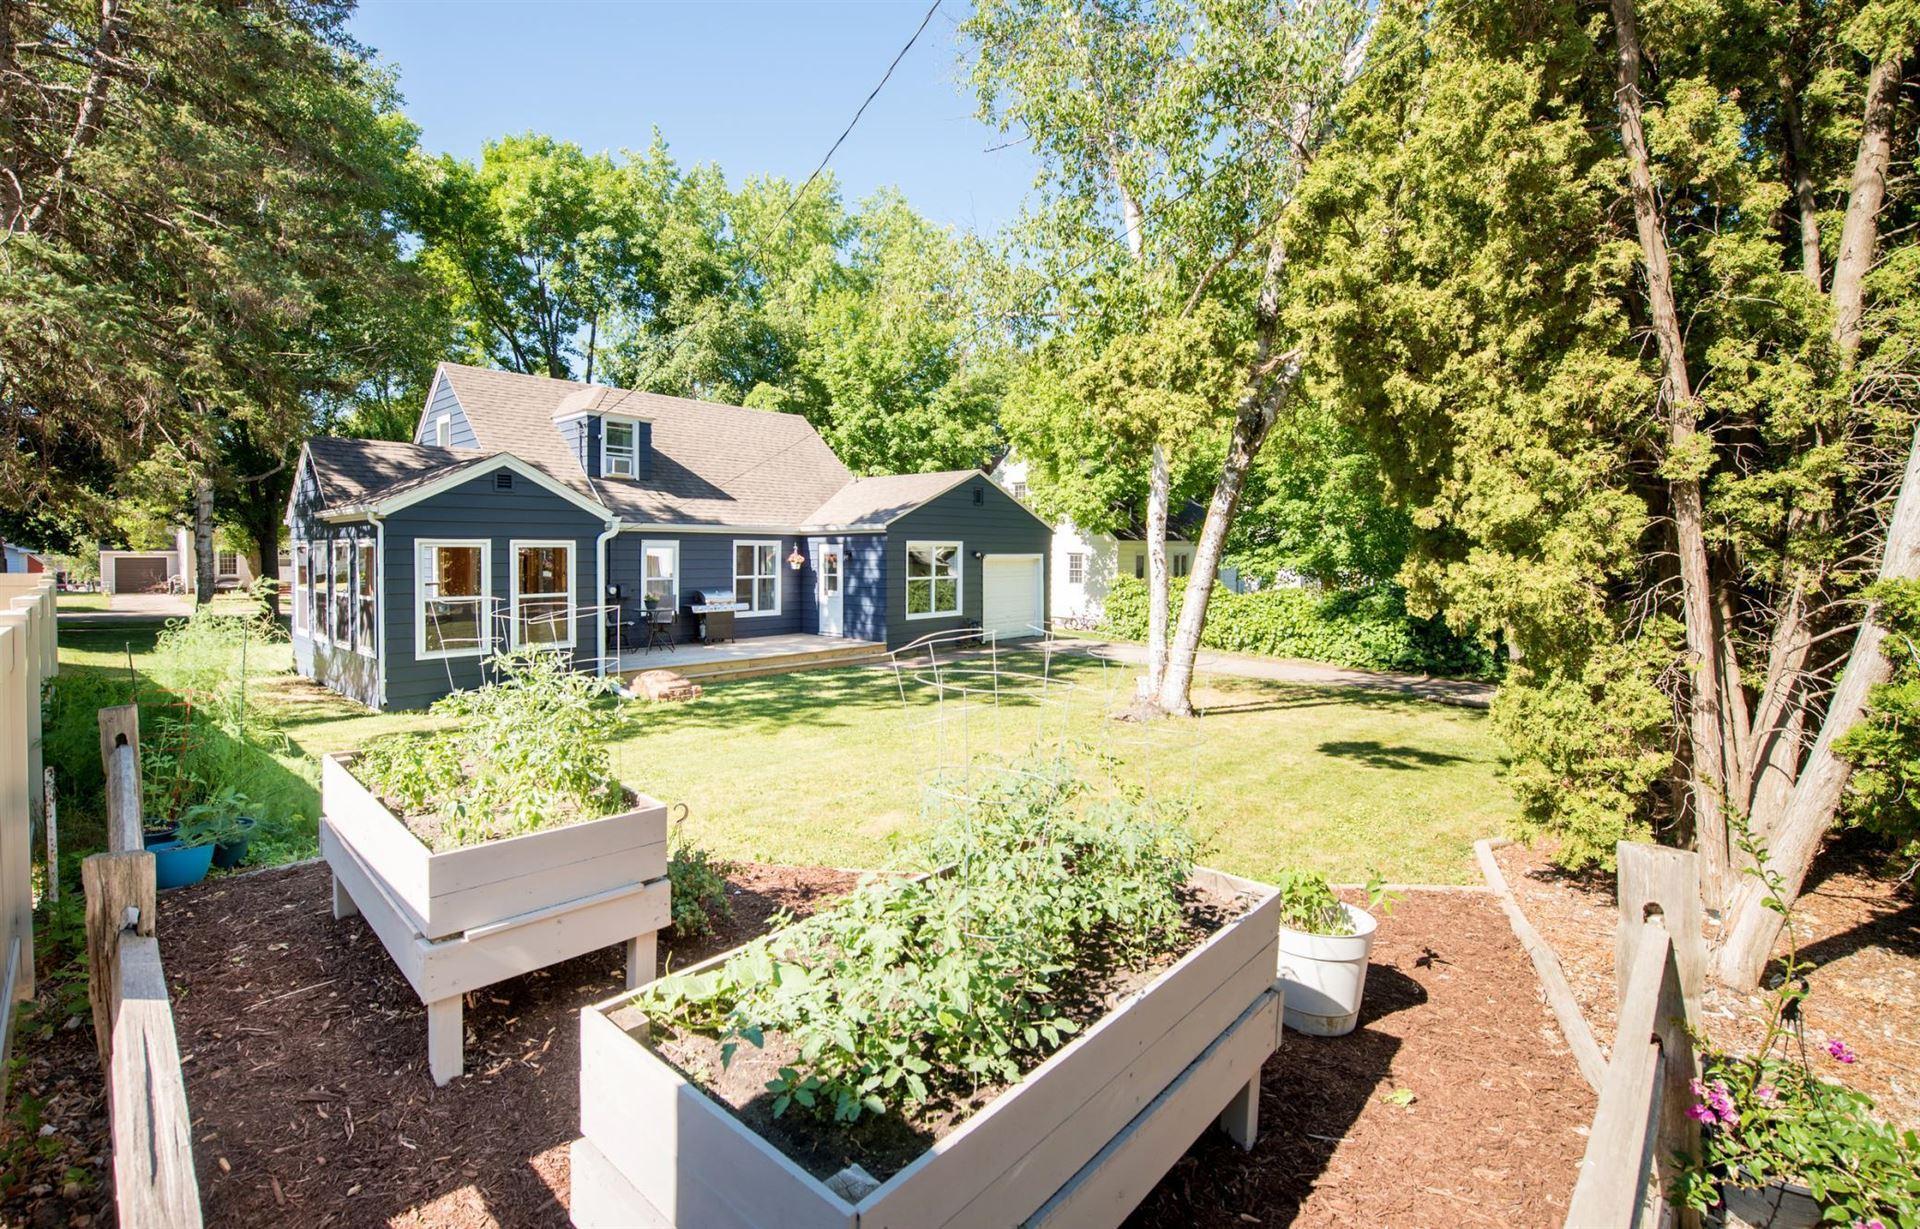 Photo of 217 3rd Avenue SE, Glenwood, MN 56334 (MLS # 6006346)